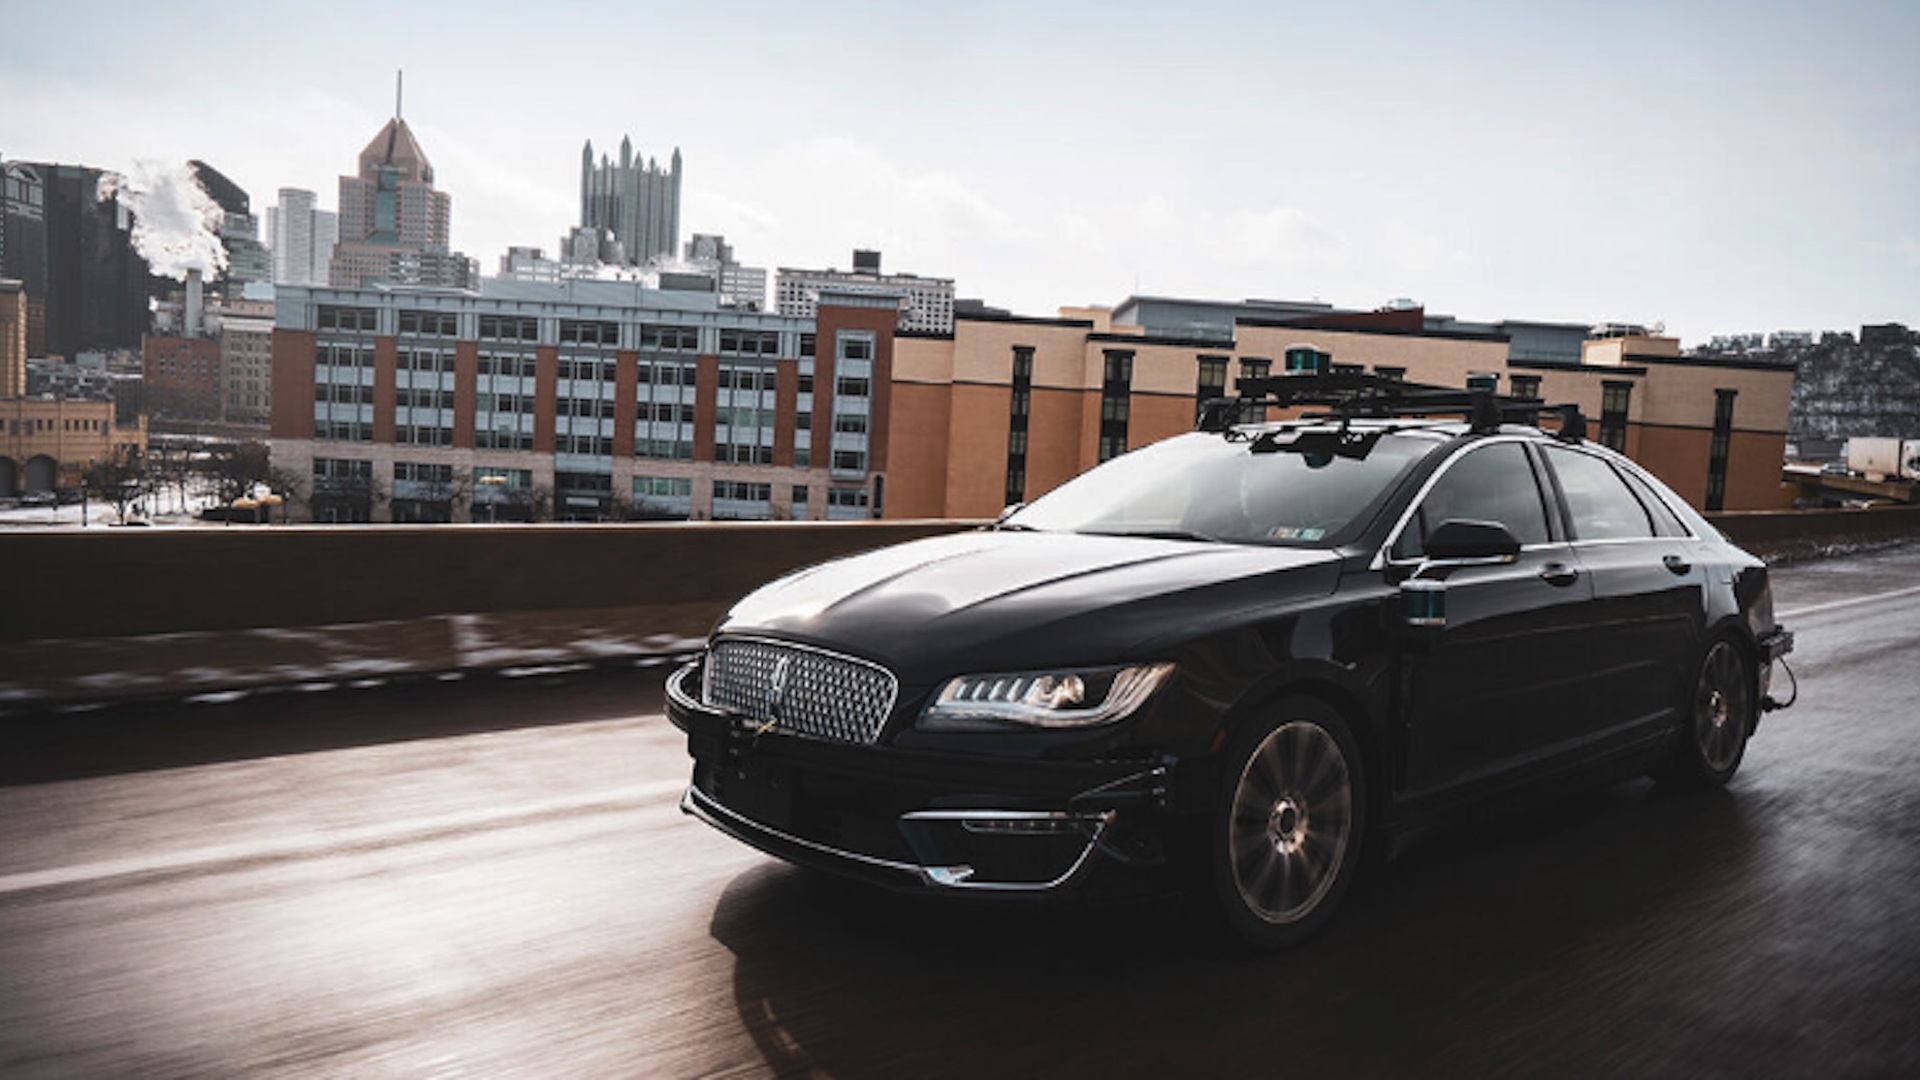 Aurora Innovation self-driving car prototype